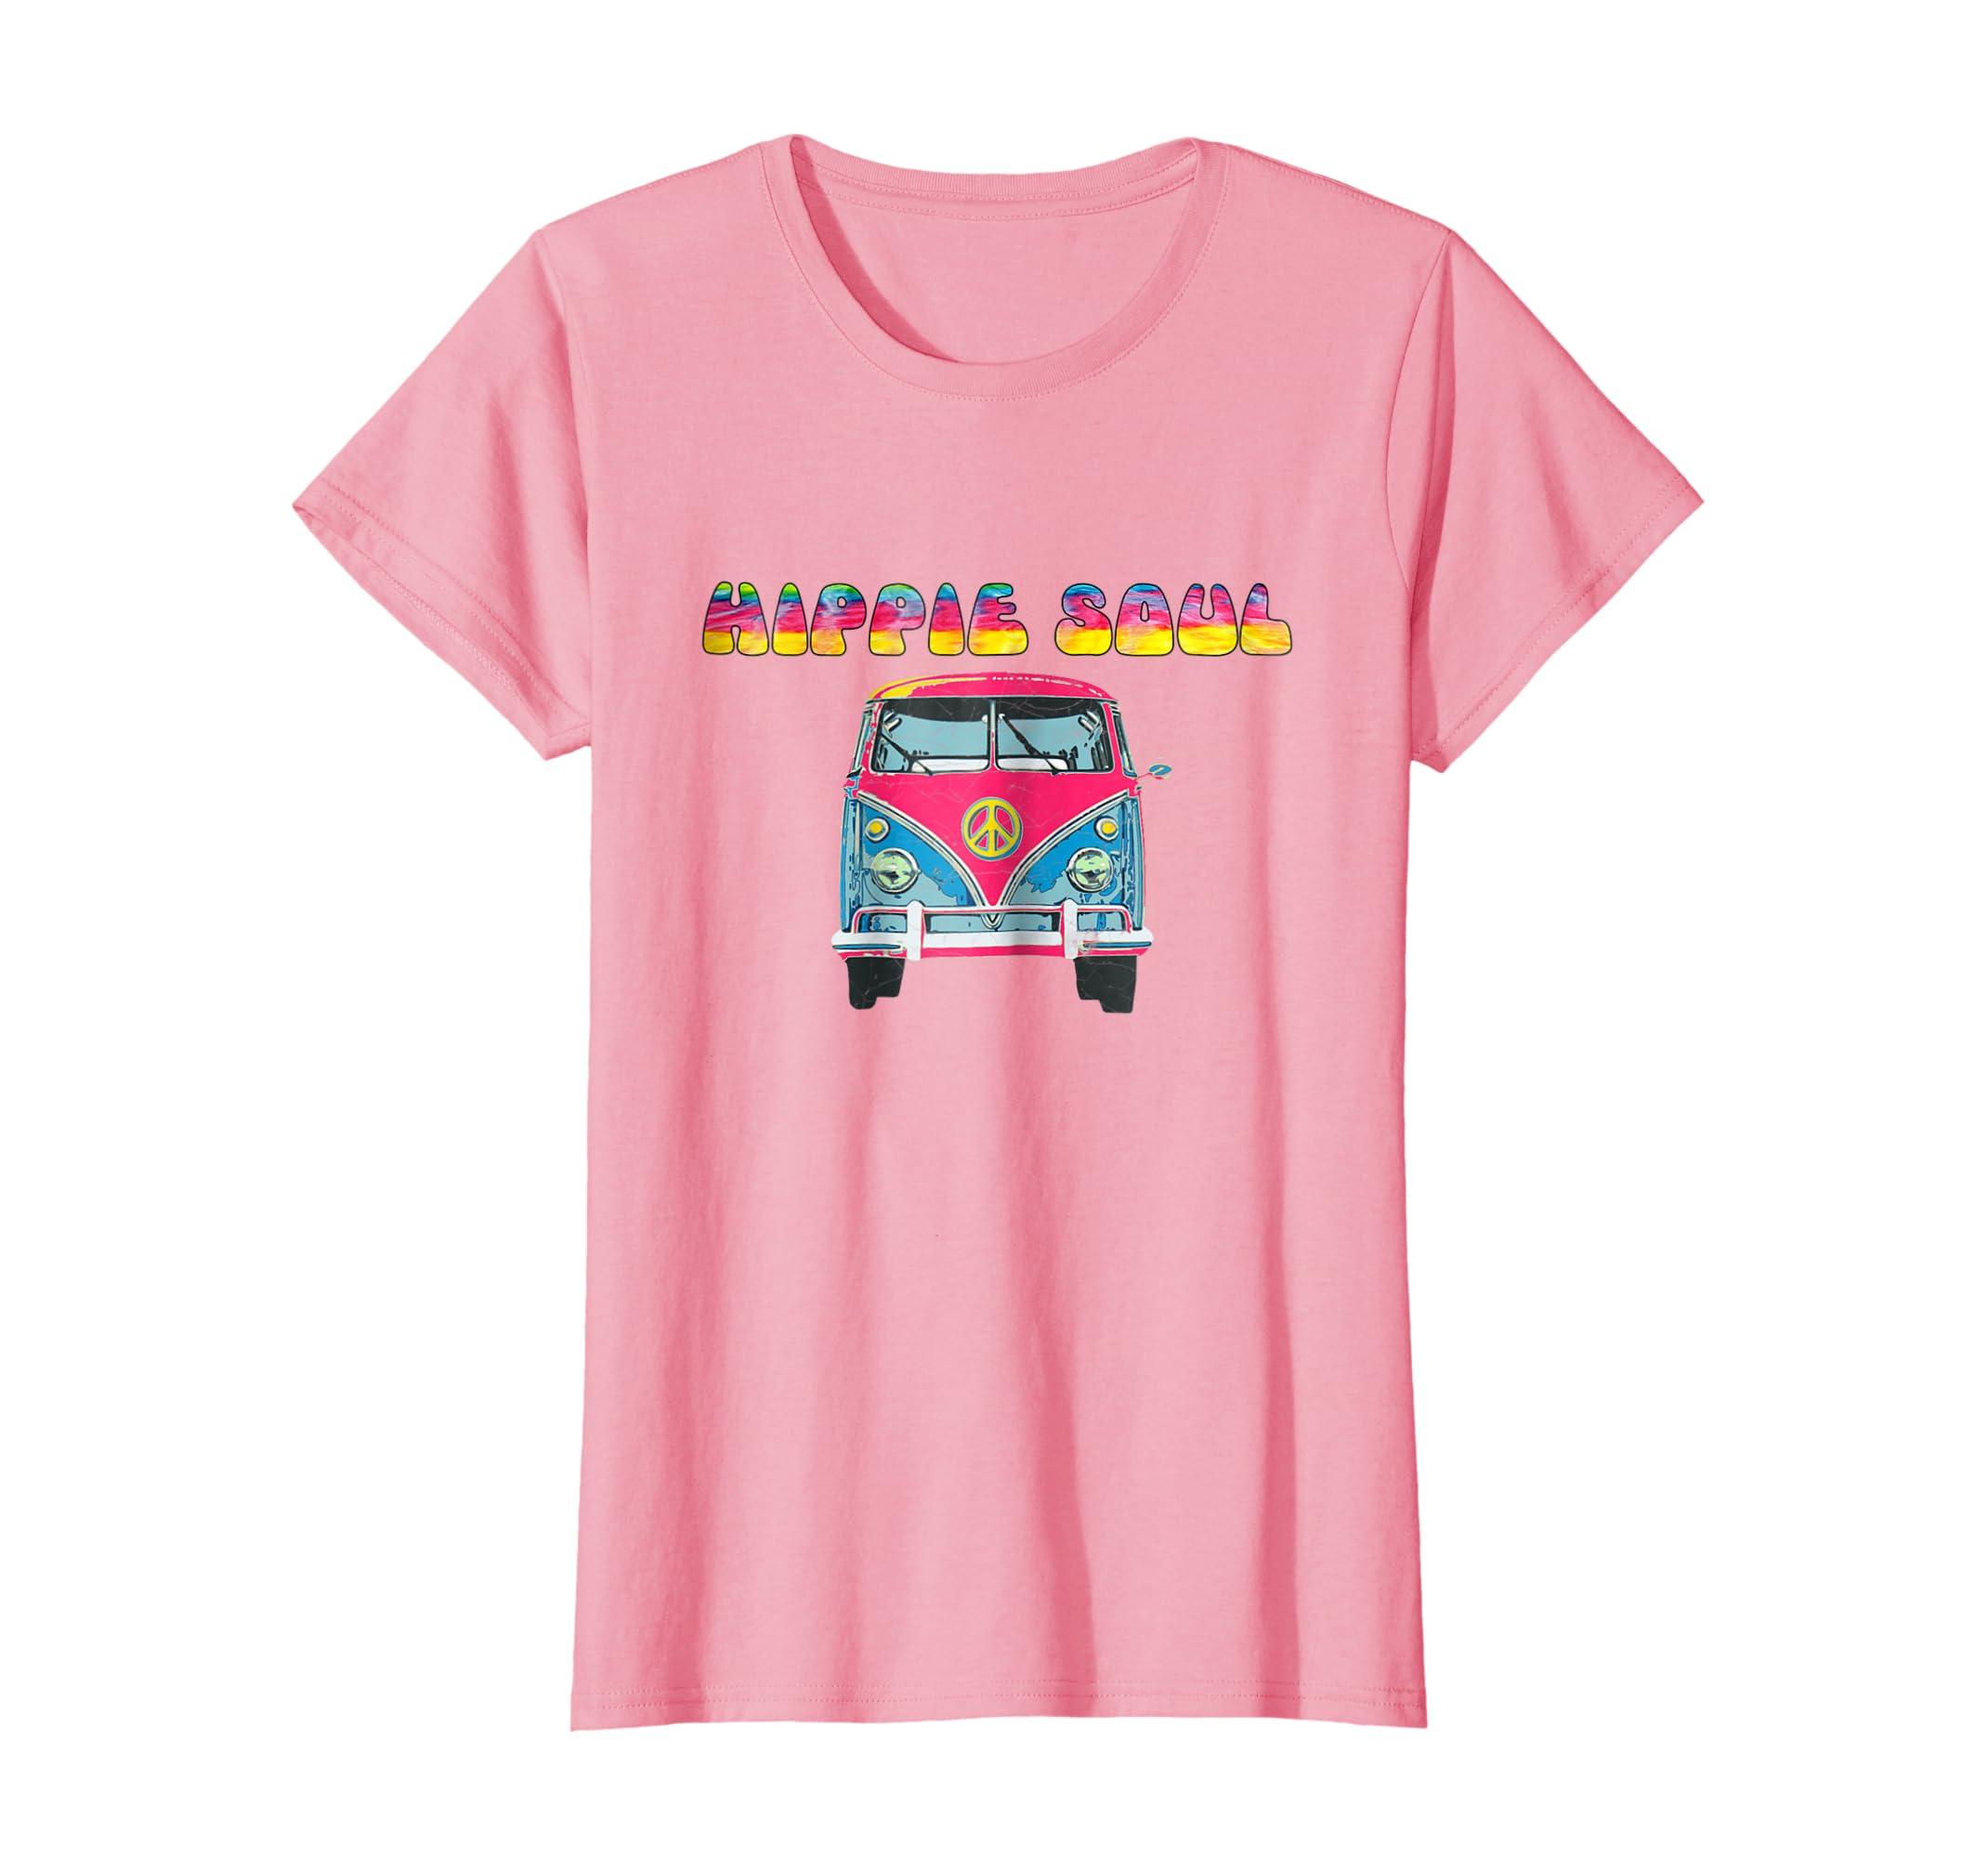 d0b439791 Amazon.com: Vintage Hippie Soul Tie Dye Van Shirt: Clothing